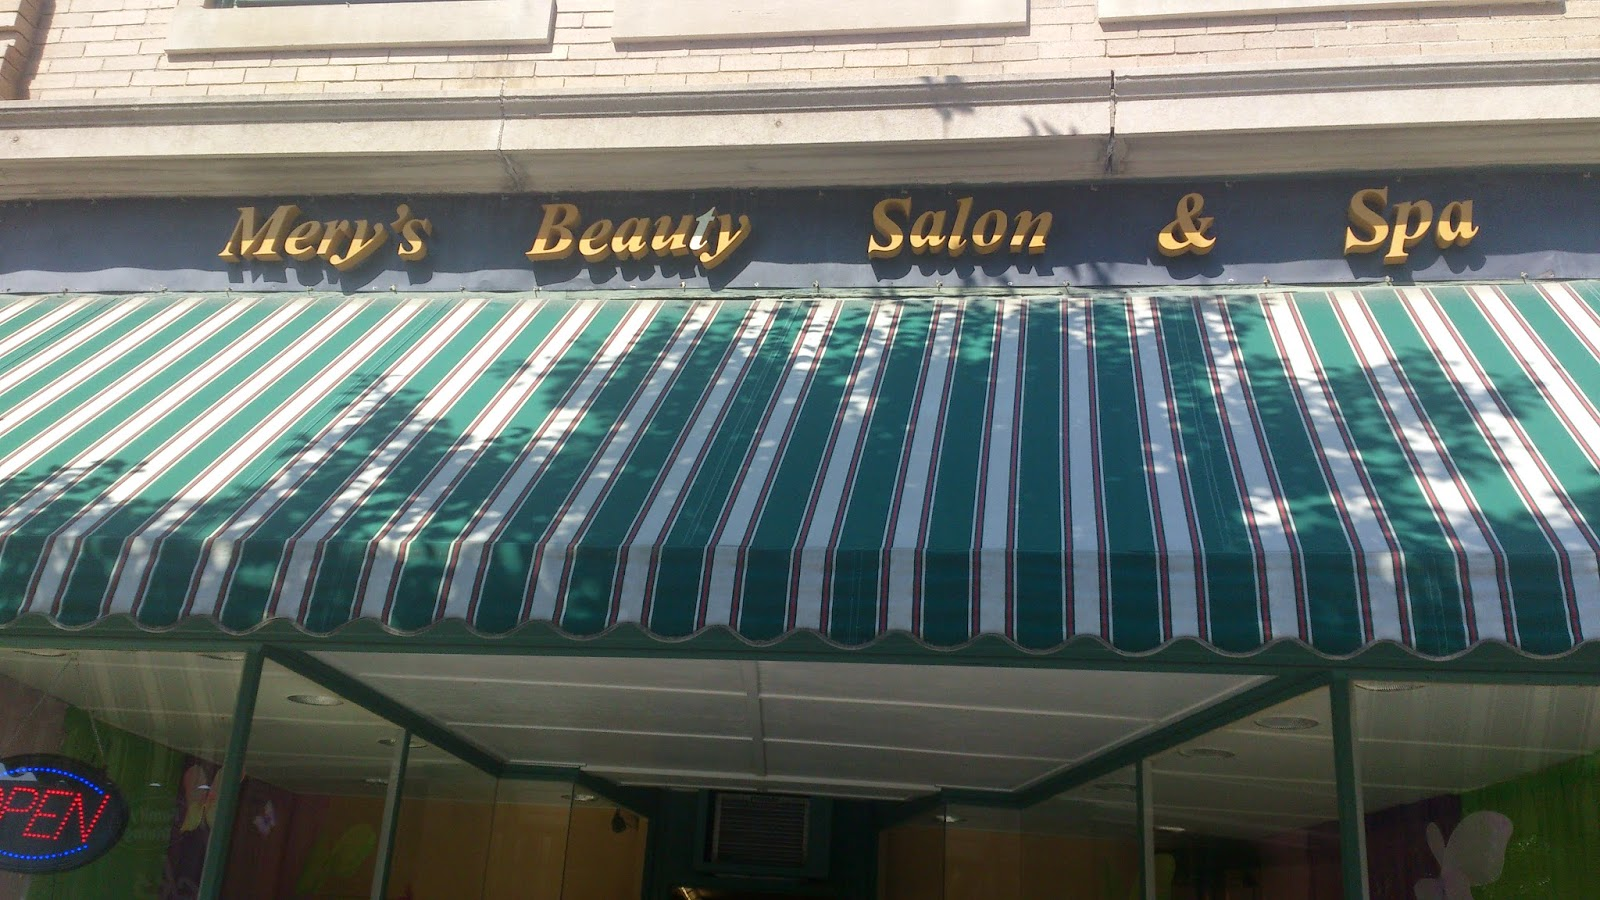 Mery's Beauty Salon & Spa, Milford. Ma